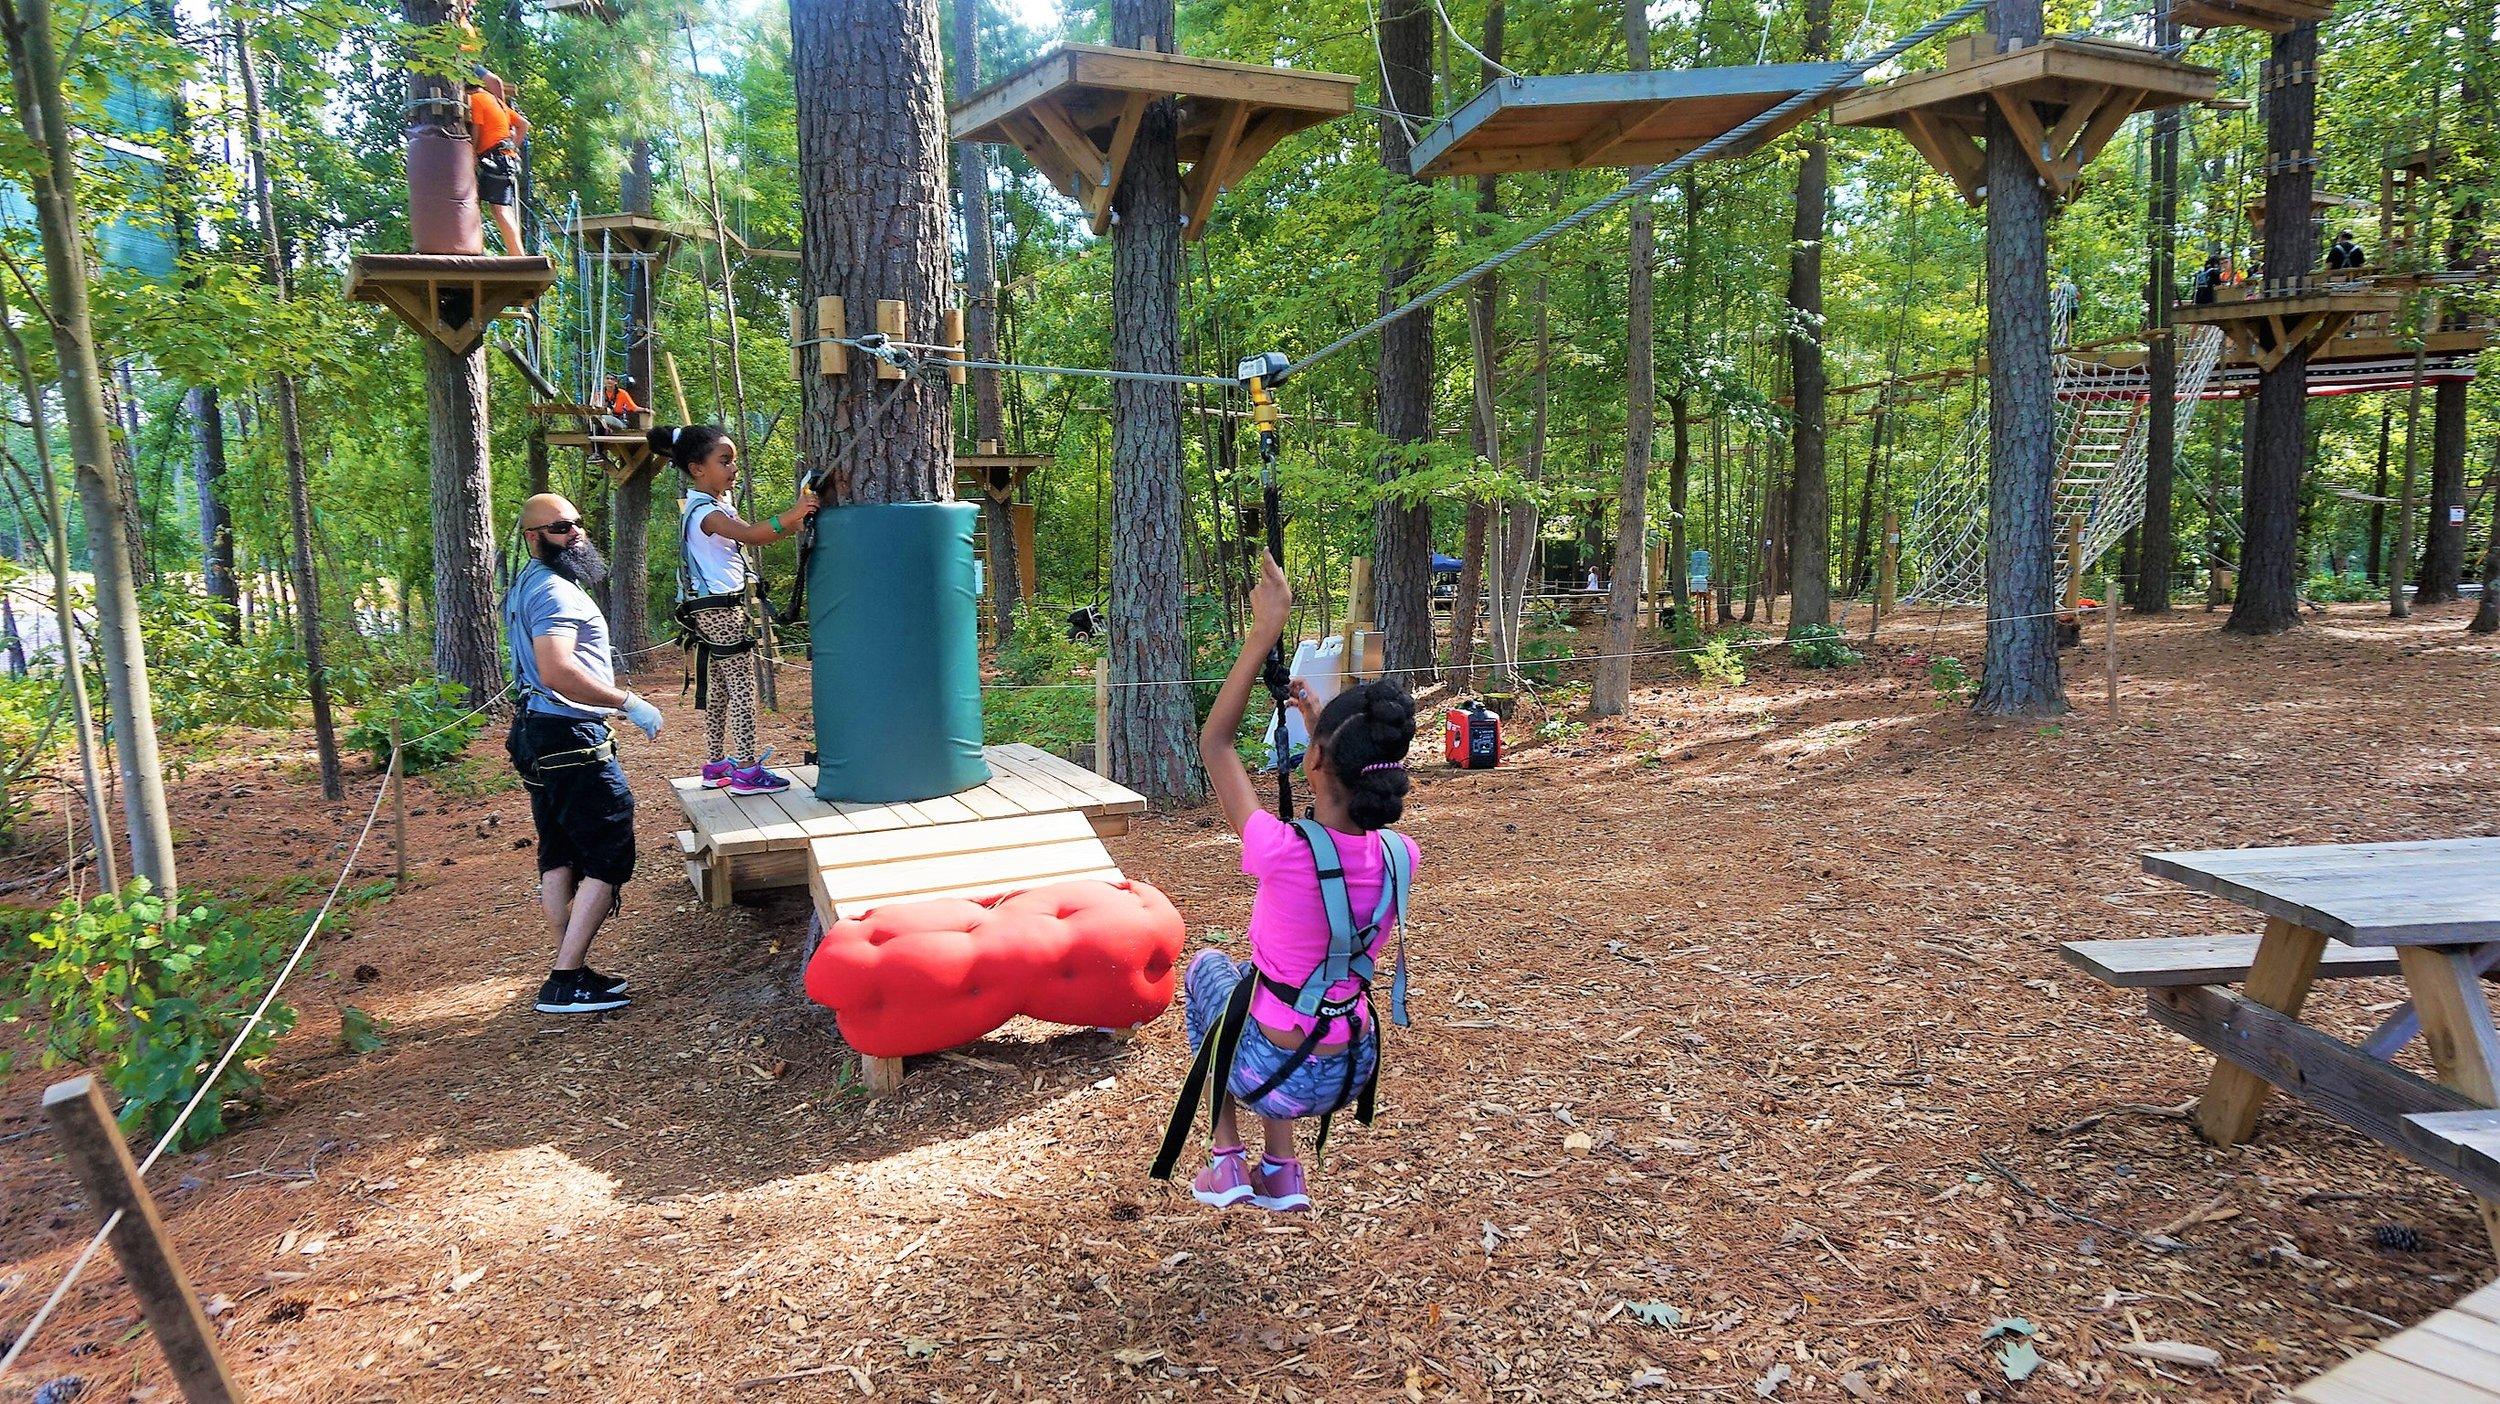 2 Peanut Butter Girls at TreeRunner Adventure Park.